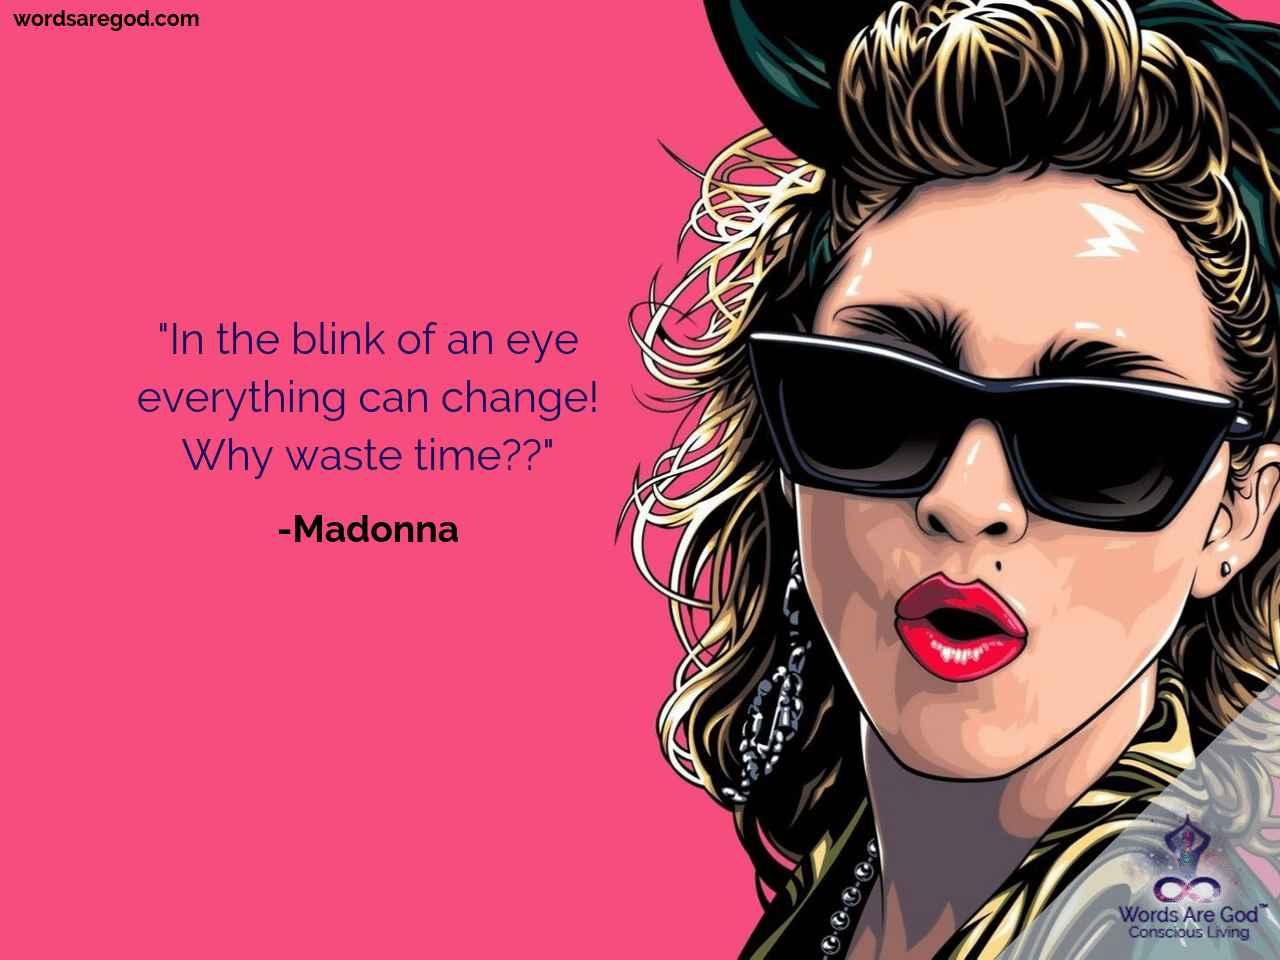 Madonna Life Quote